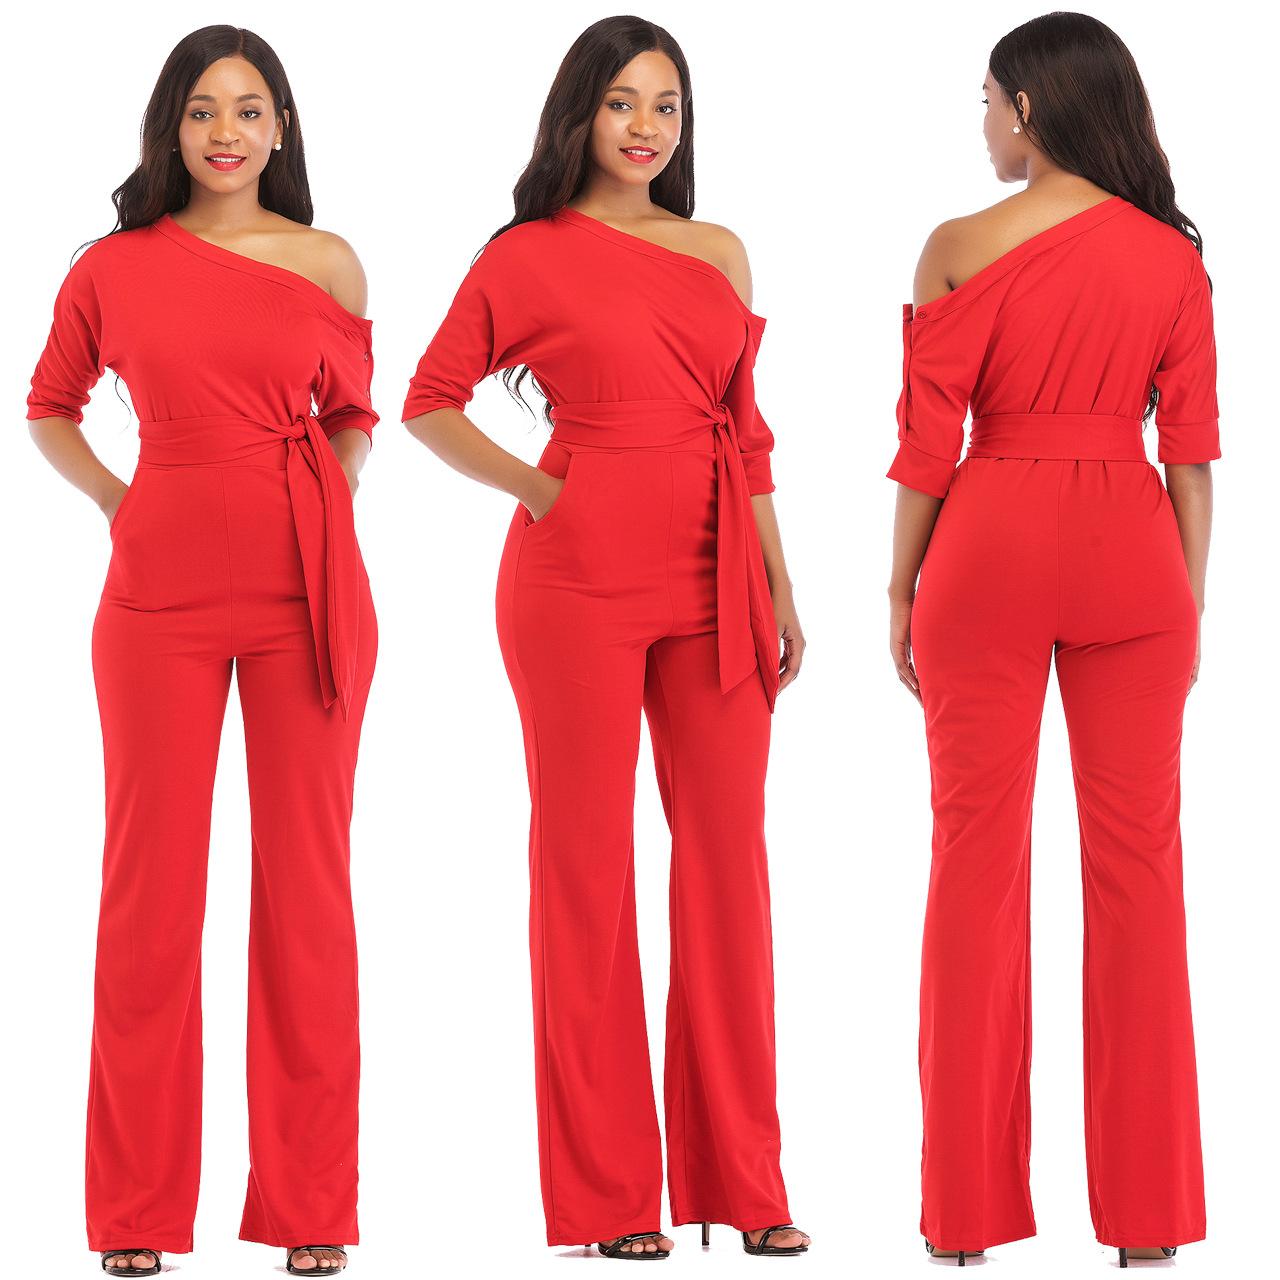 2019 Solid Color Jumpsuit Women Halter Half Sleeve Strapless Shoulder Stretch Wide Long Pants Casual Jumpsuit Rompers